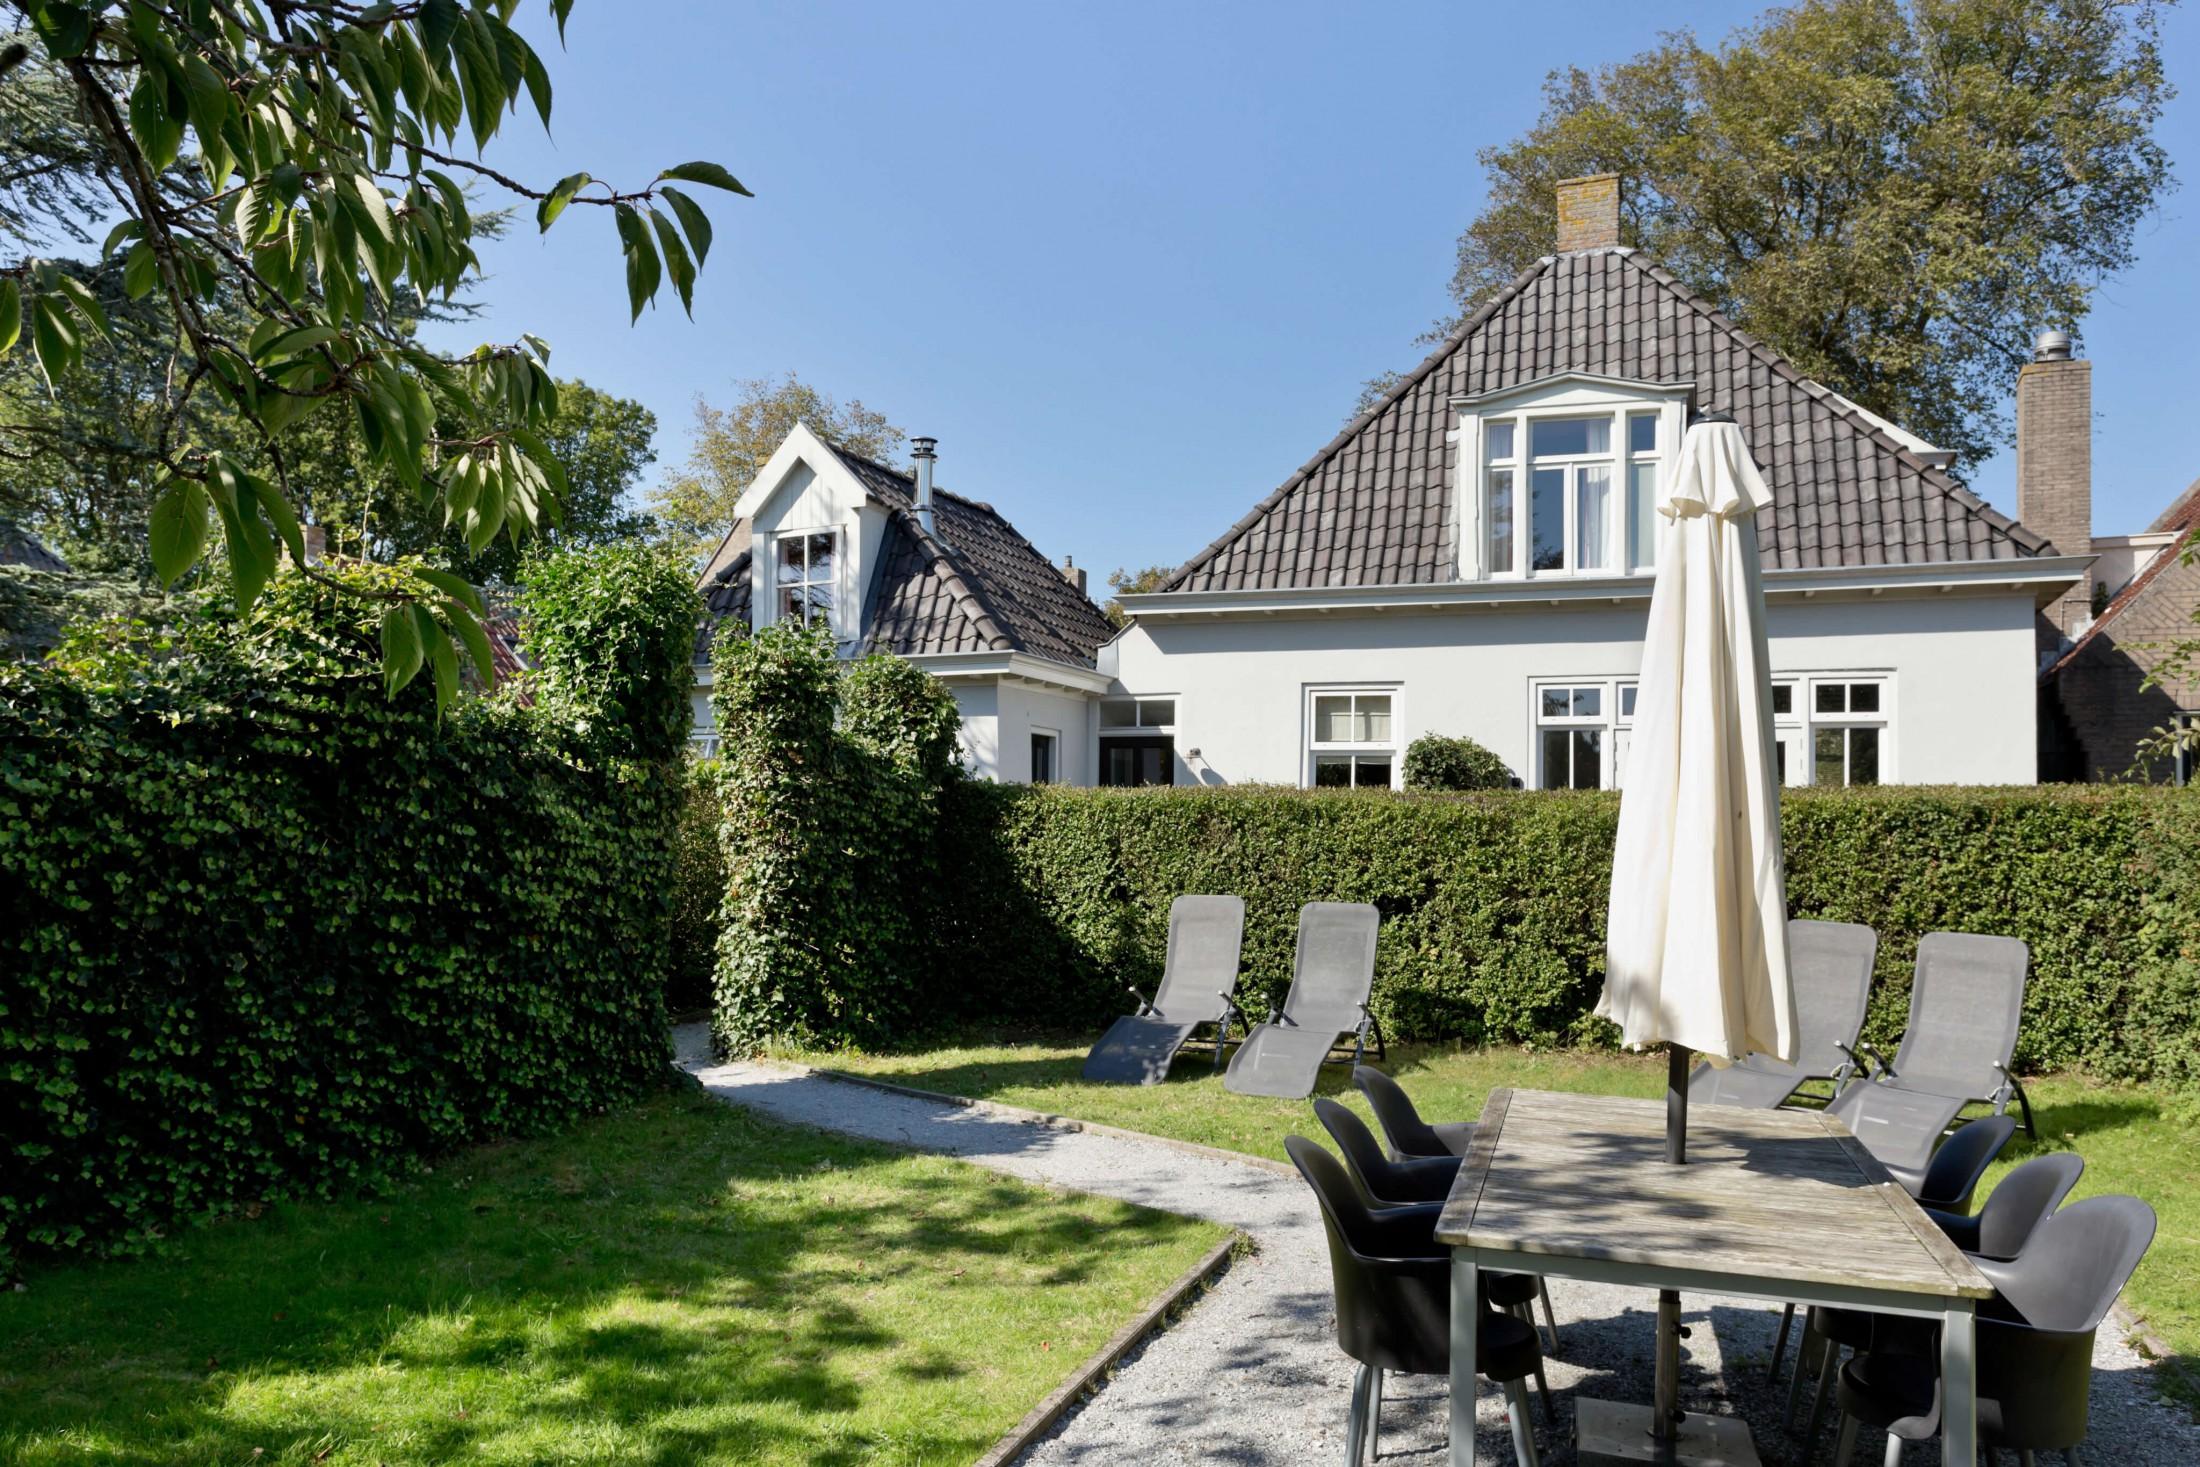 Vakantiehuis Us Wente op Schiermonnikoog met riante tuin